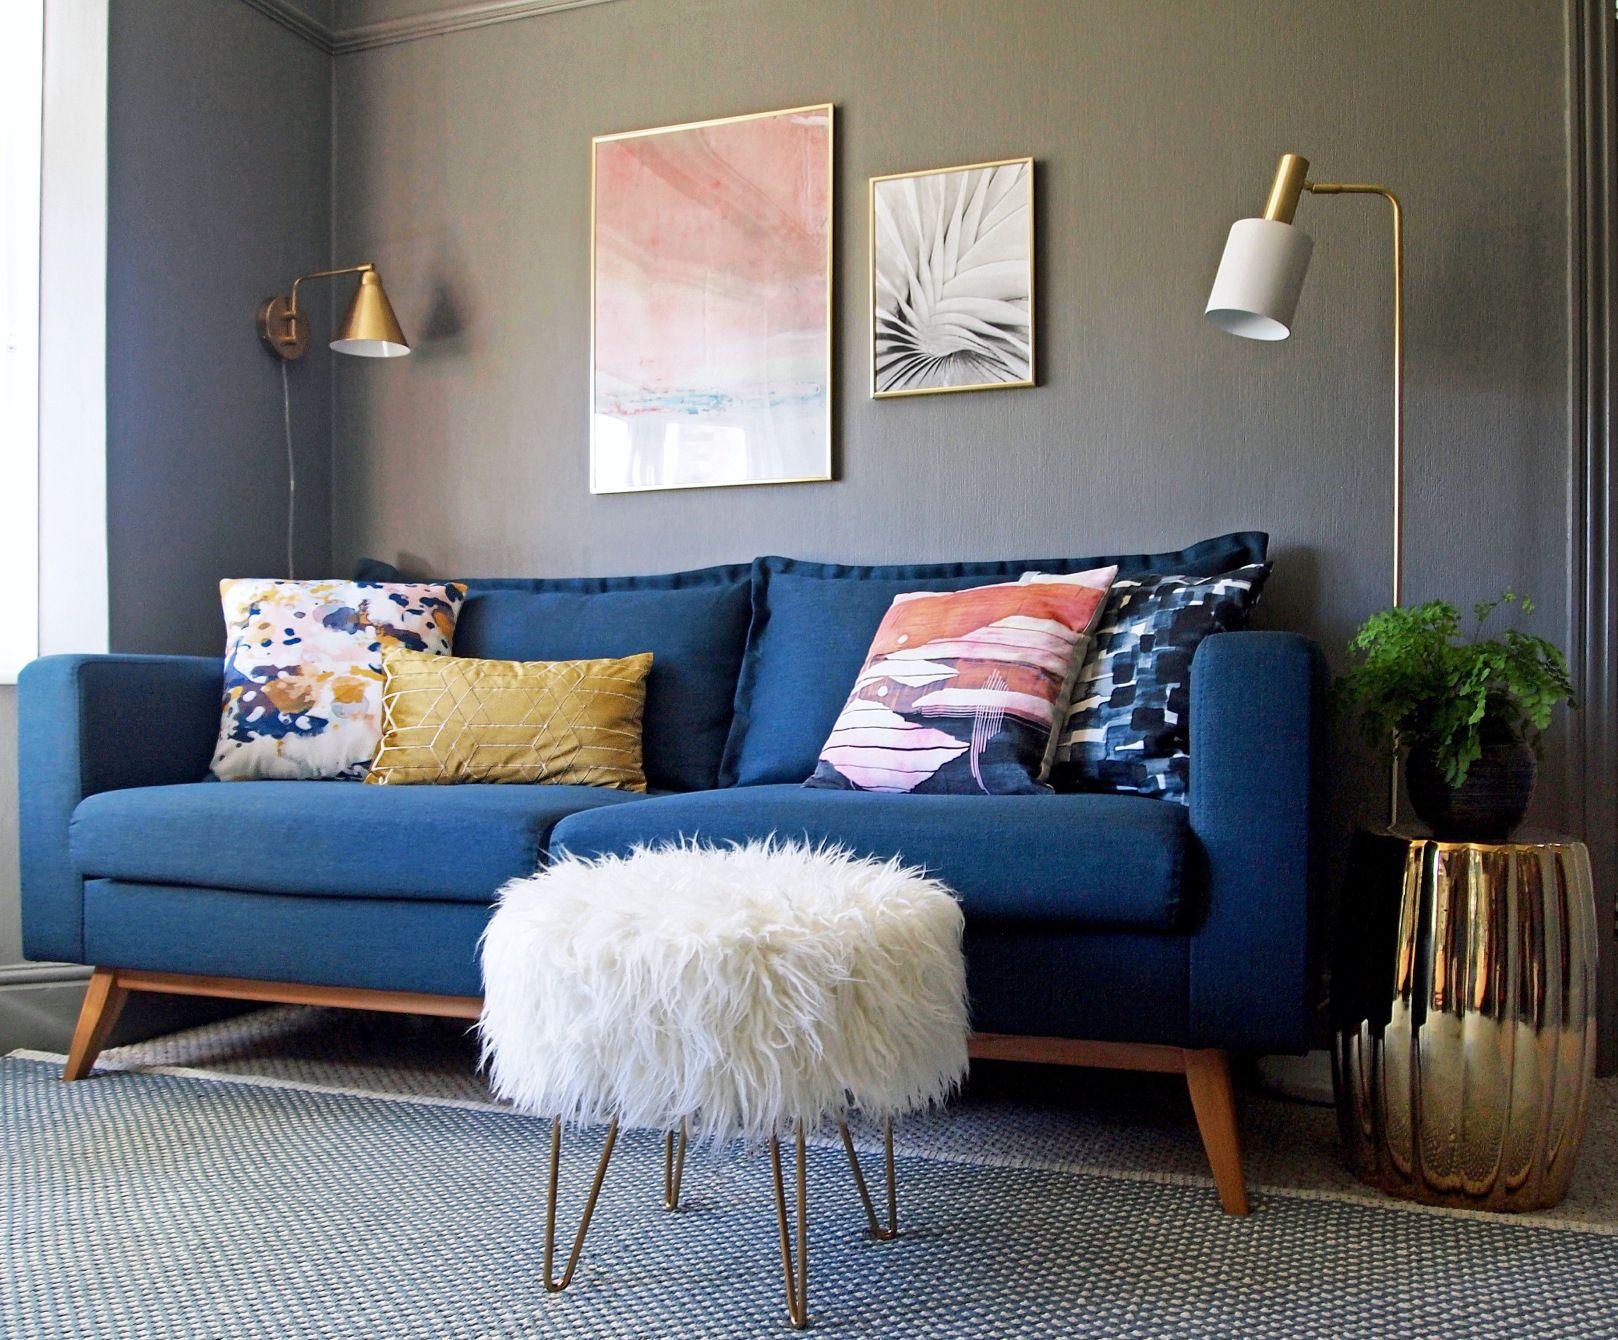 Revamp Restyle Reveal My Living Room Reveal First Sense Interiors Blue Sofas Living Room Blue Sofa Living Living Room Decor Colors